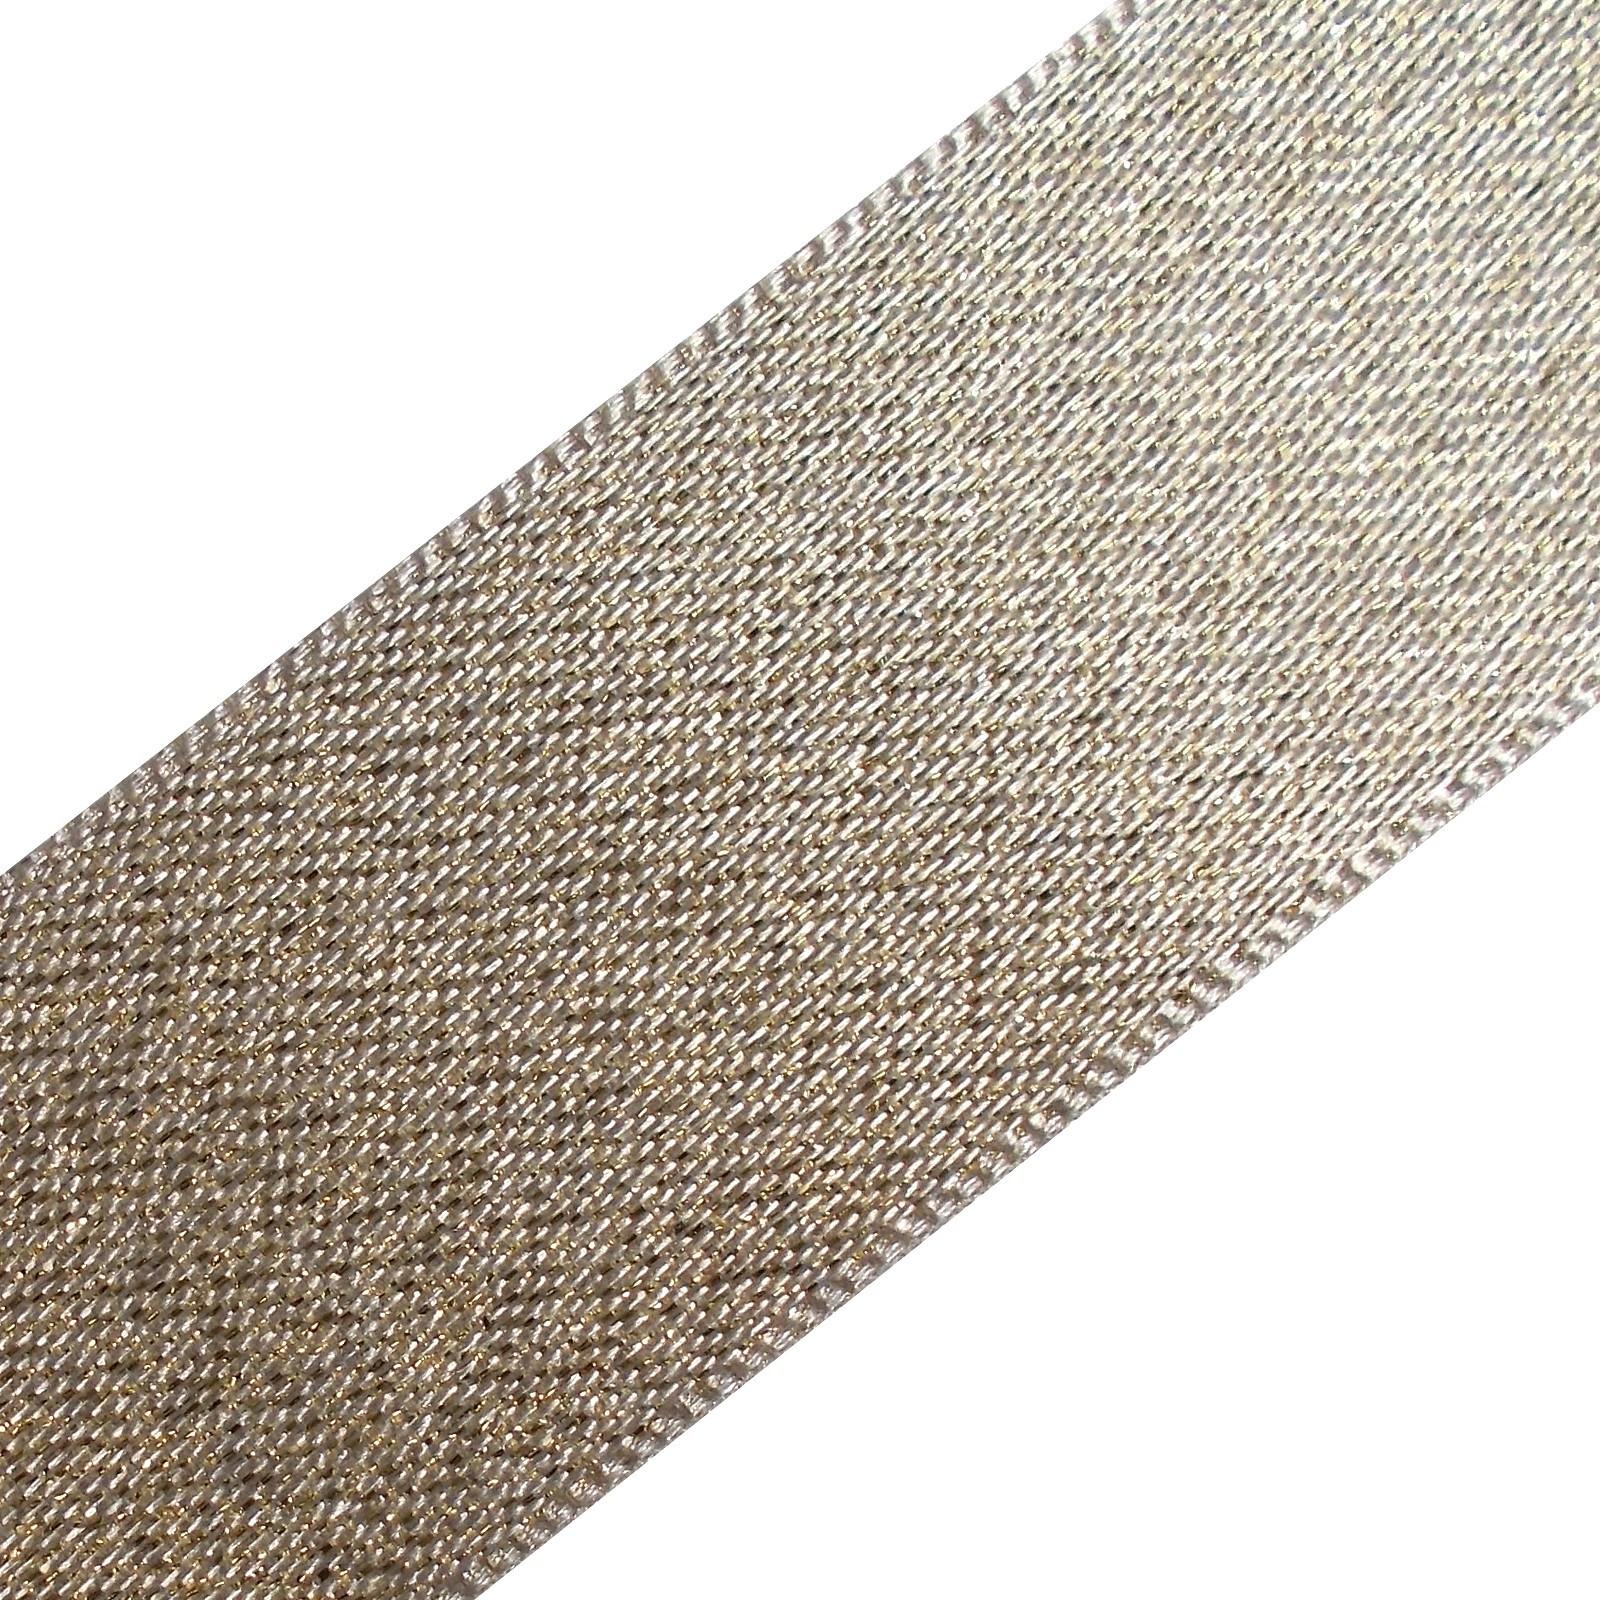 Berisfords Glitter Satin Ribbon 15mm wide White 1 metre length